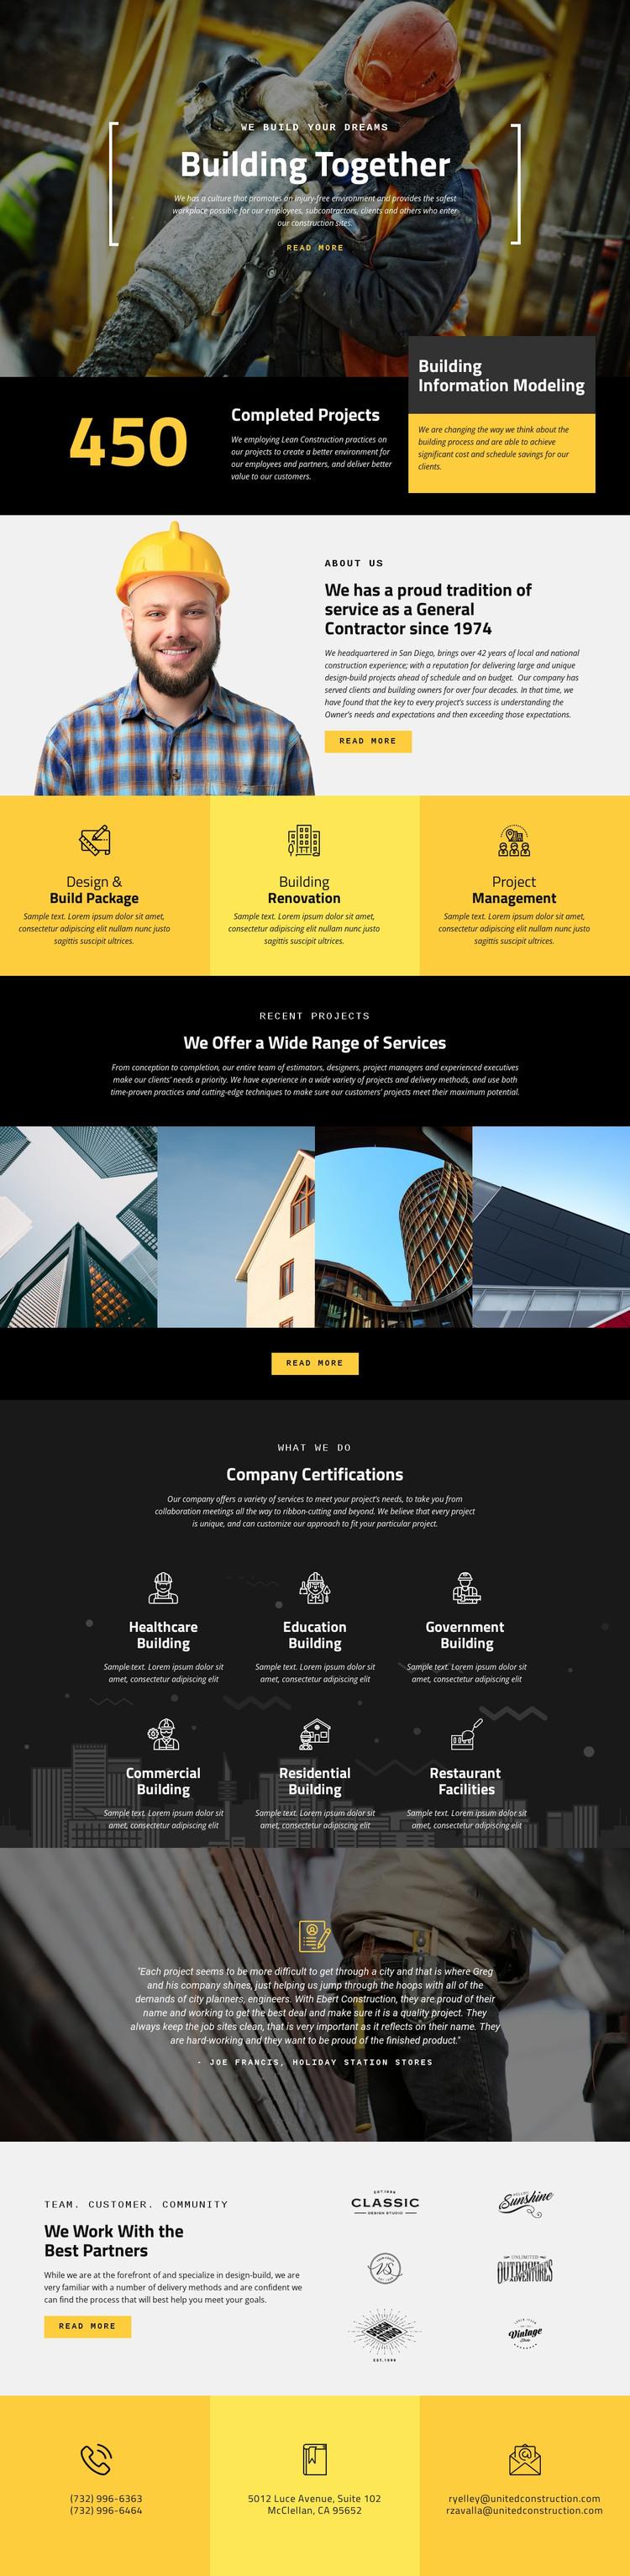 Building constructions Web Design